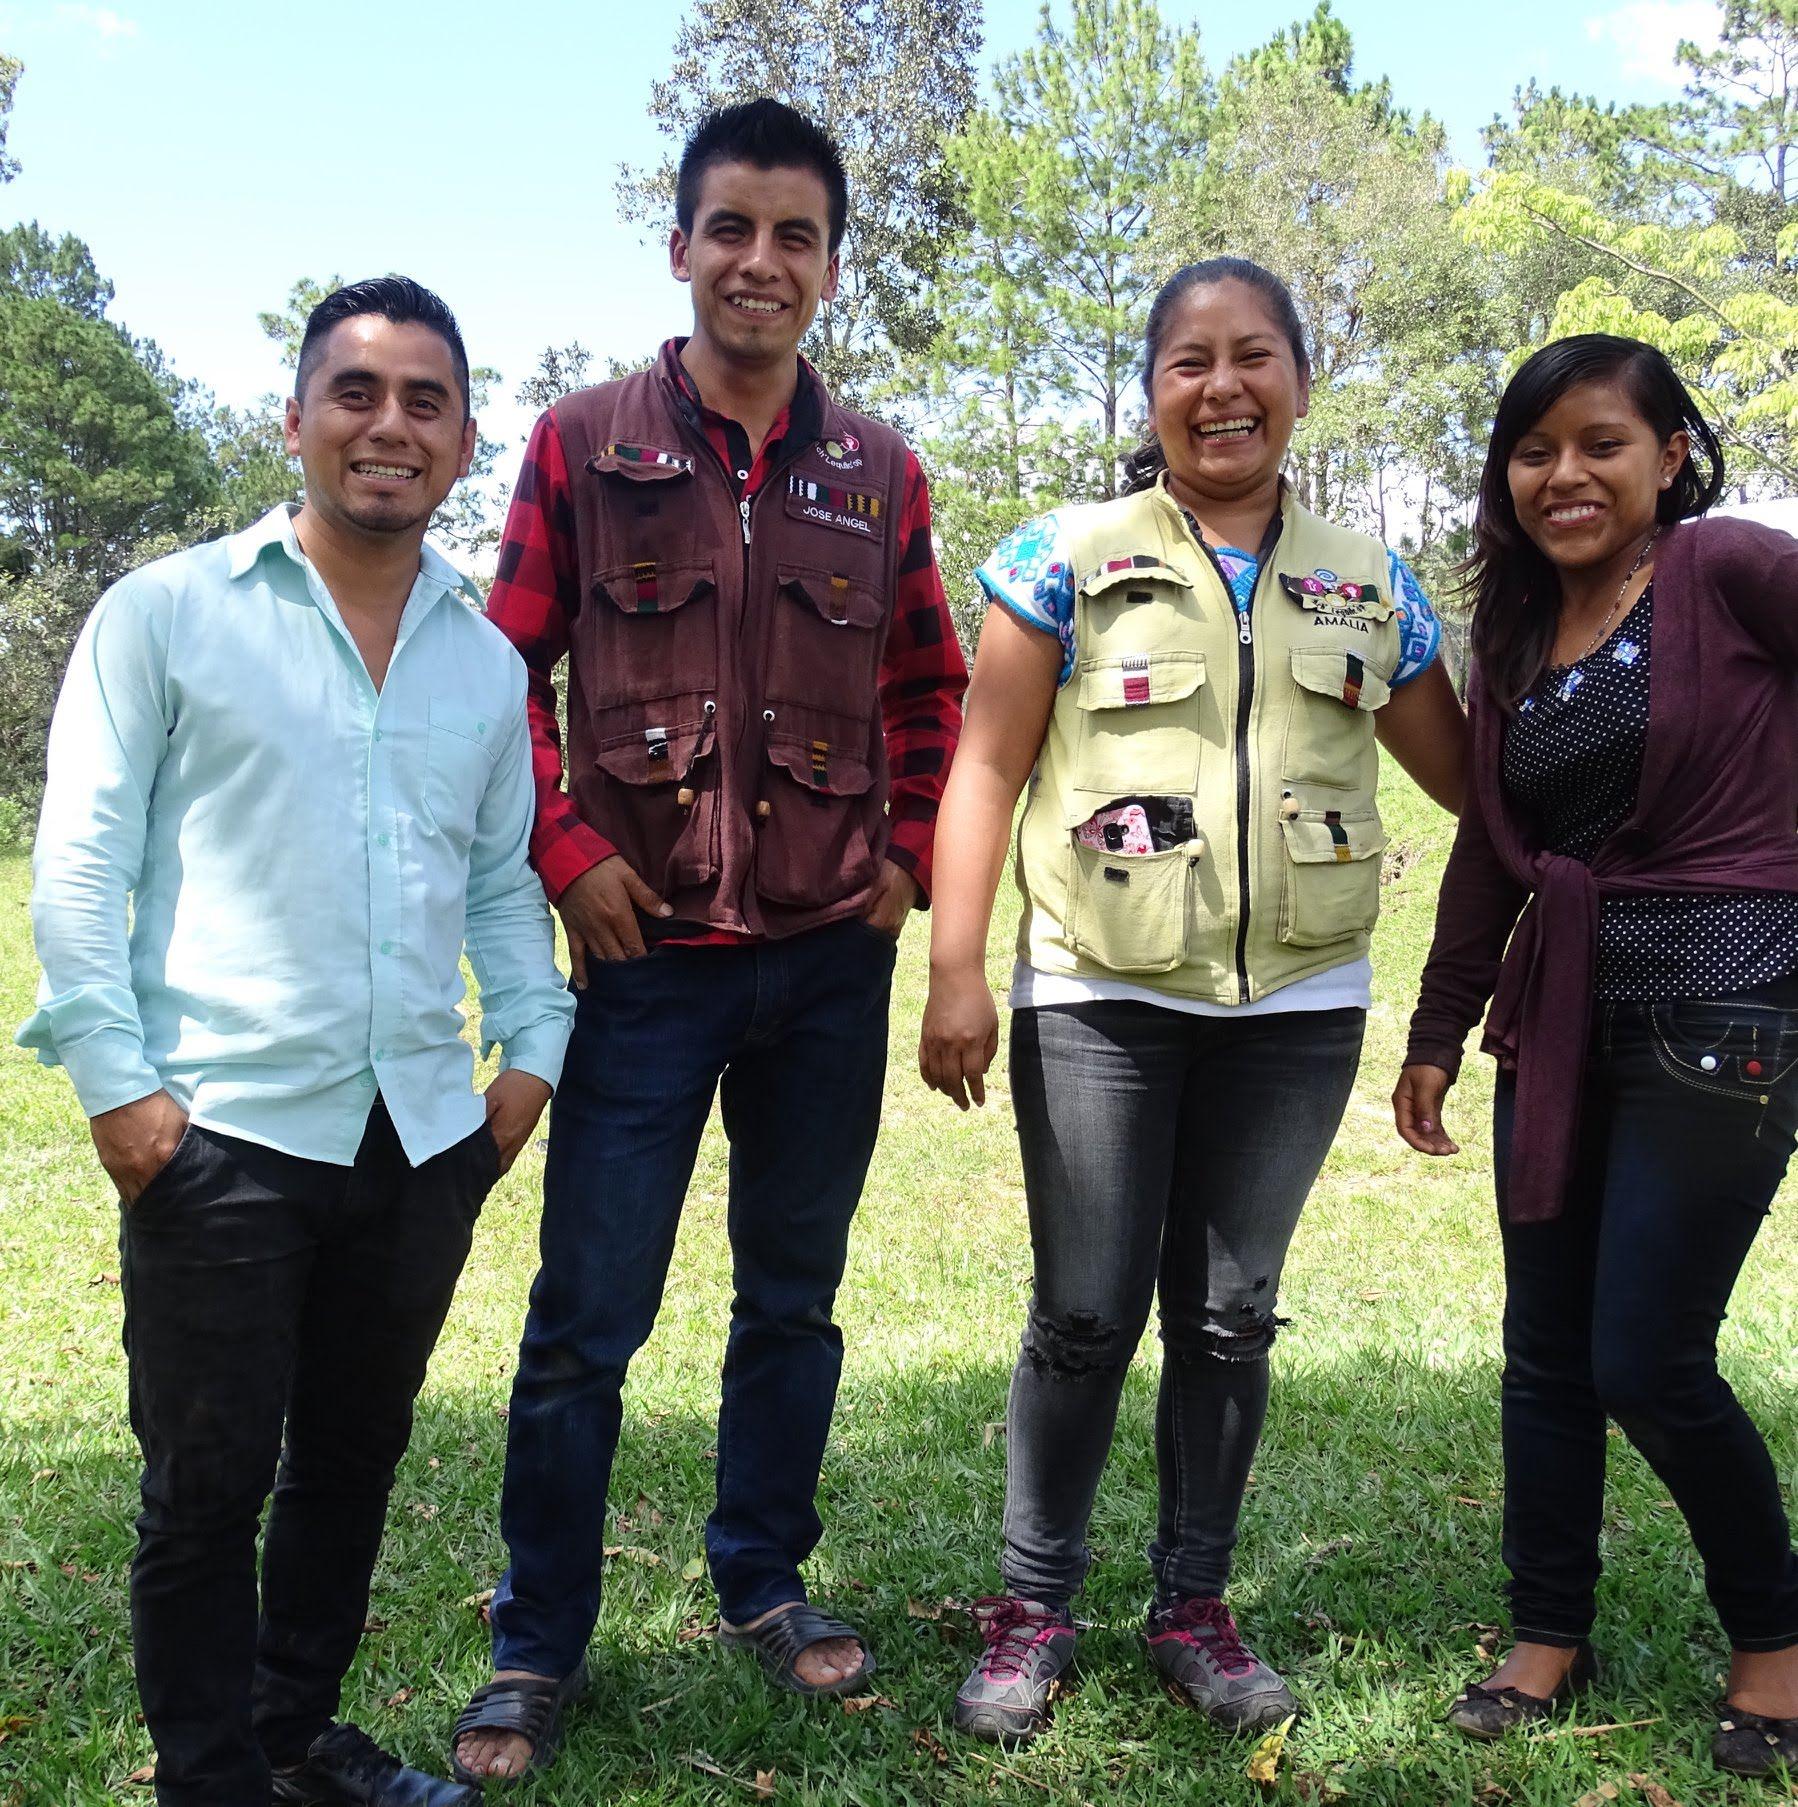 Indigenous radio staff: Gilberto, José Angel, Amalia, Herminia